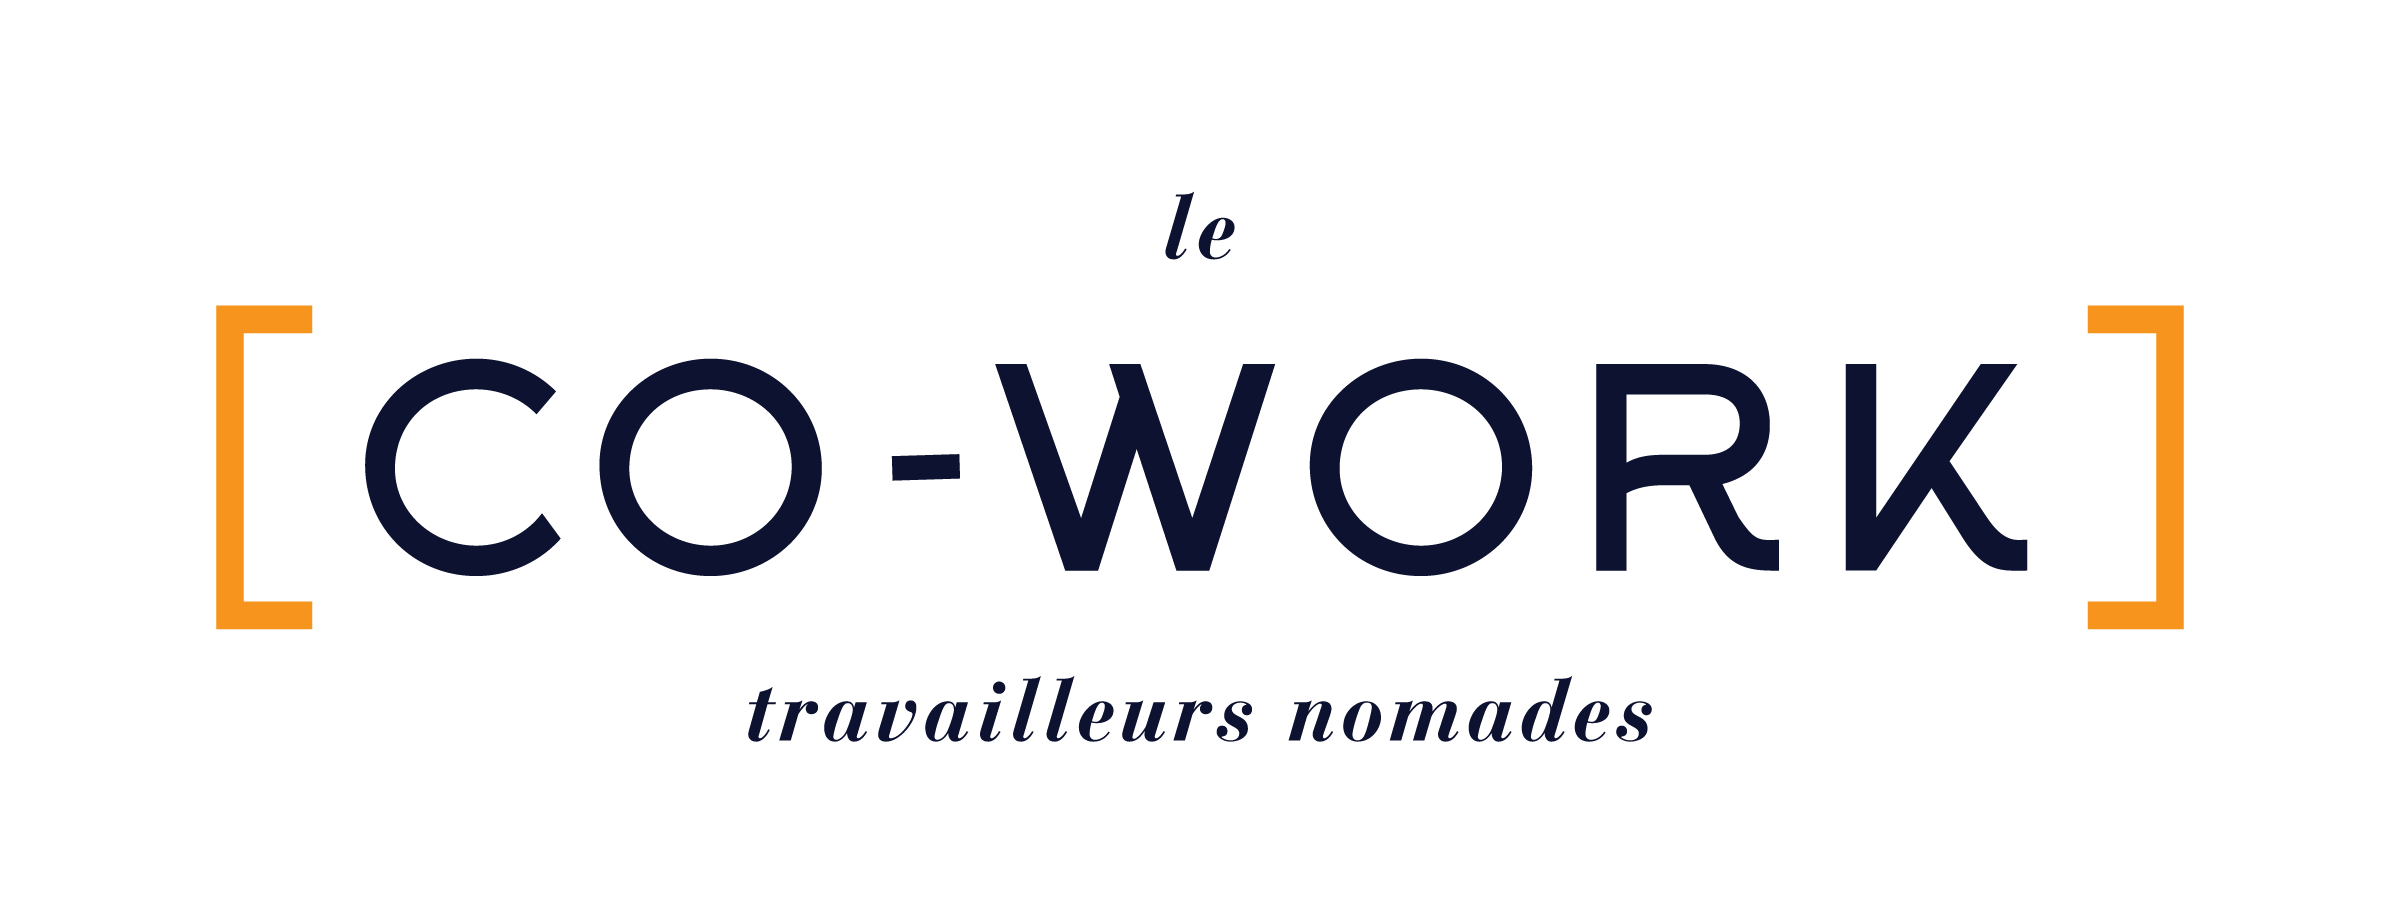 Logo Le cowork